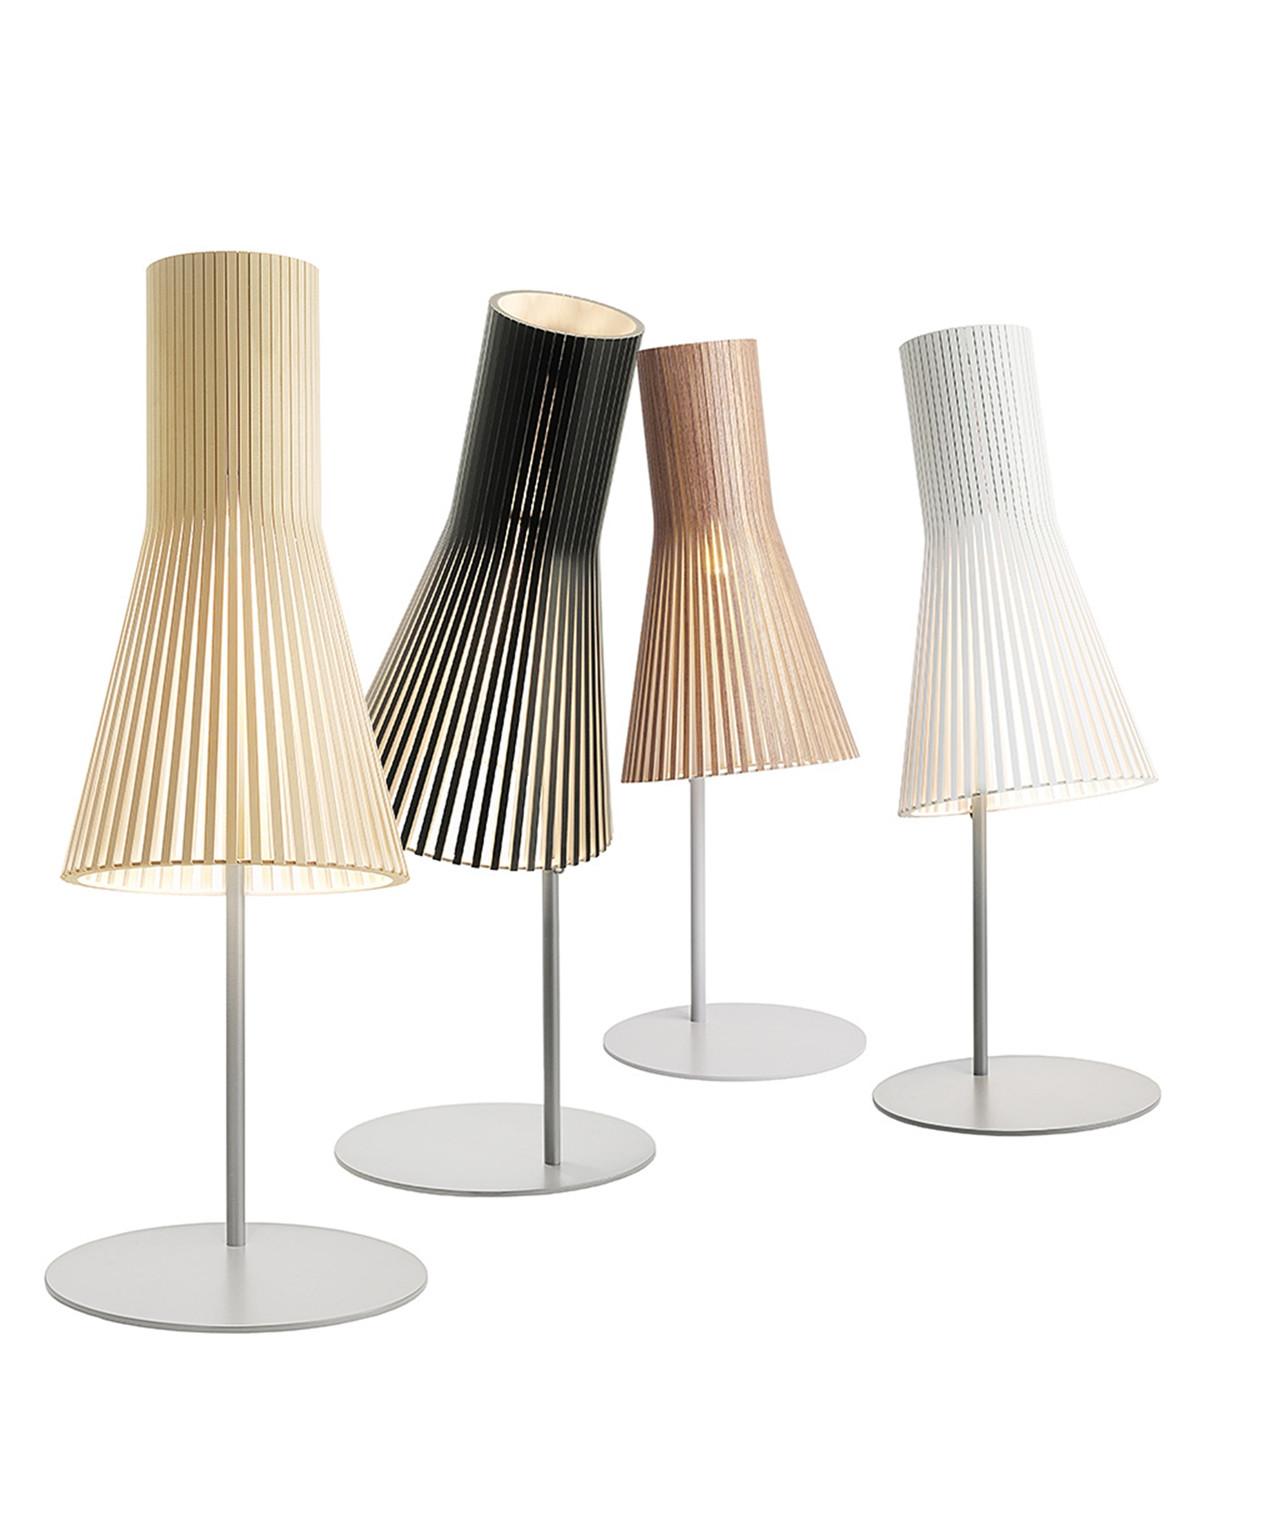 8200900081030_2 secto-4220-bordlampe-lampemesteren.dk_2.jpg